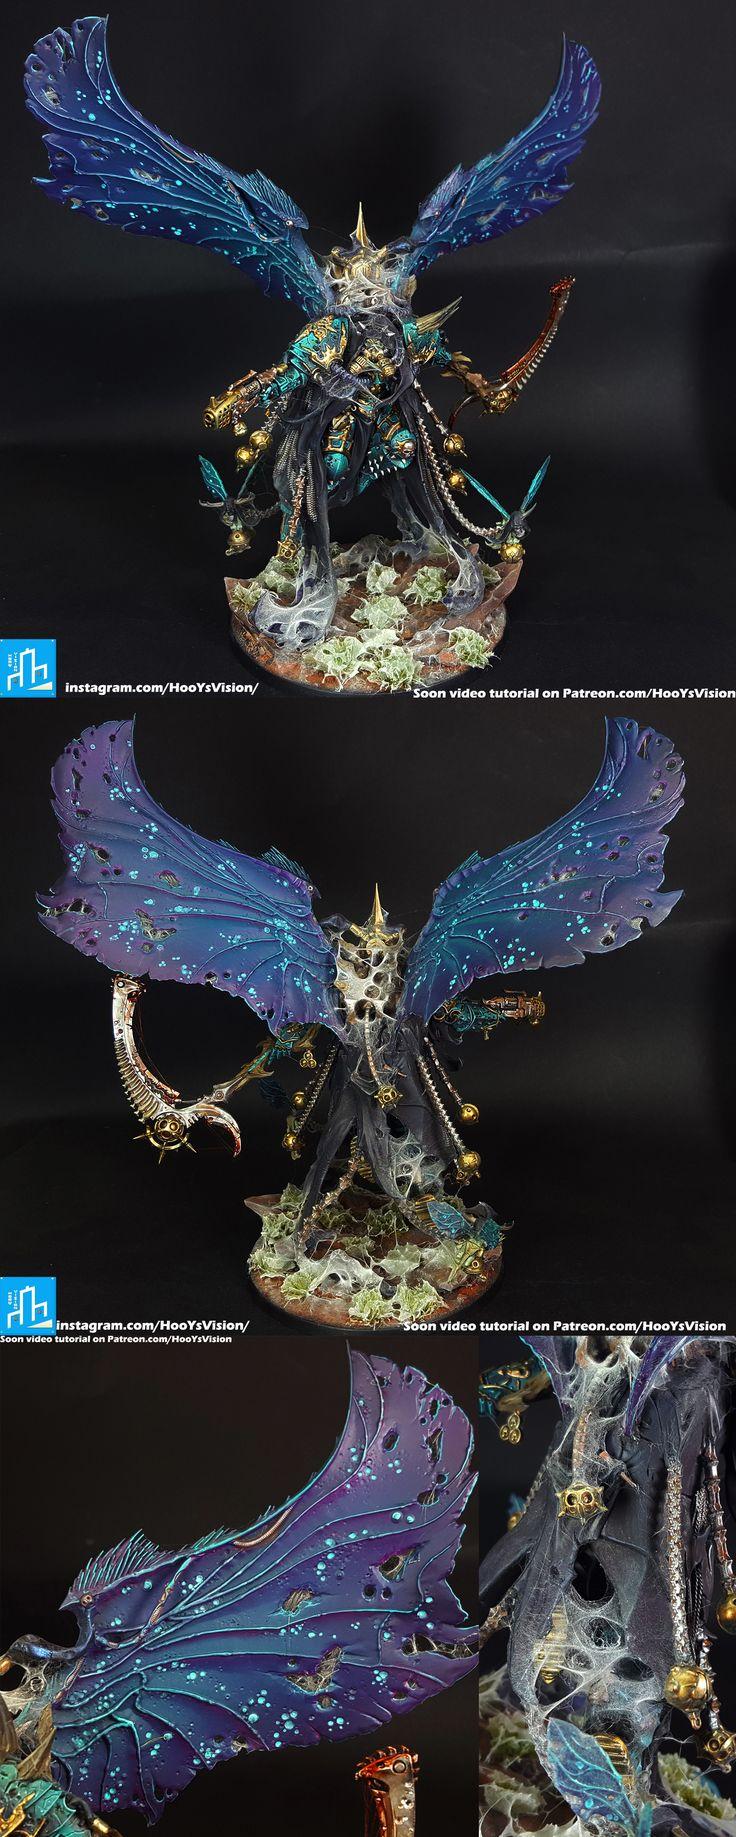 Mortarion, Daemon Primarch of Death Guard